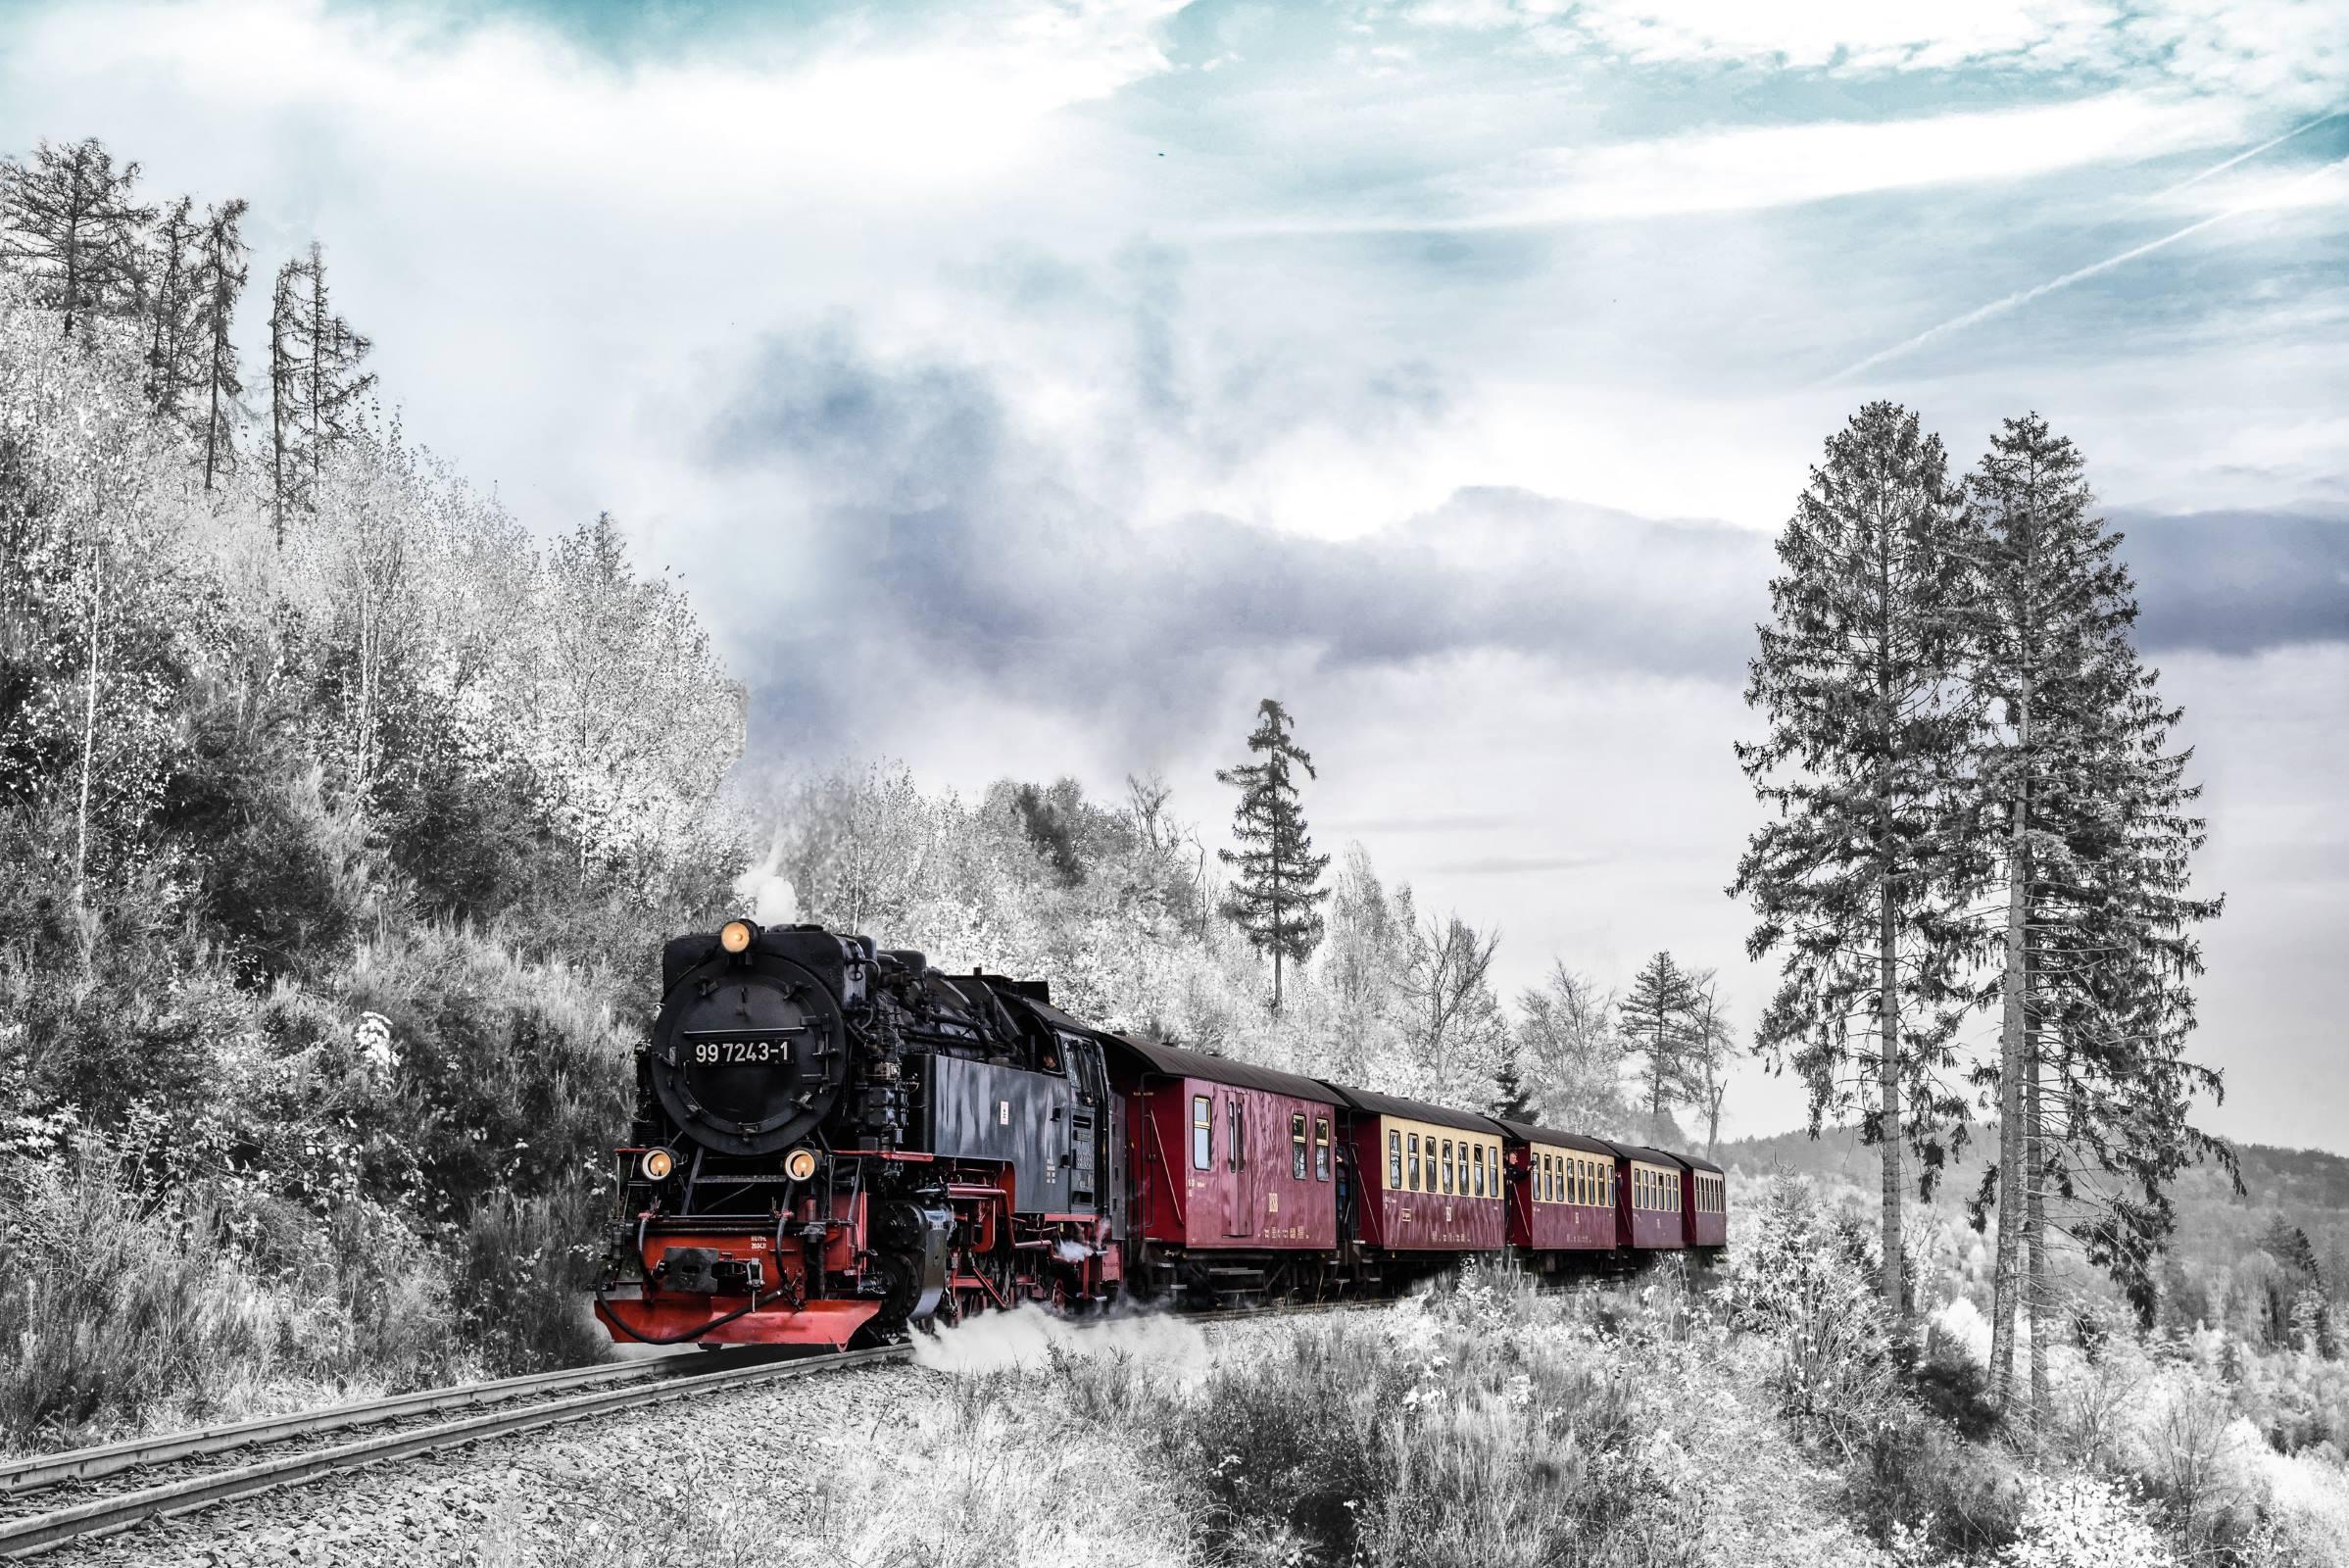 winter steam train snow trees